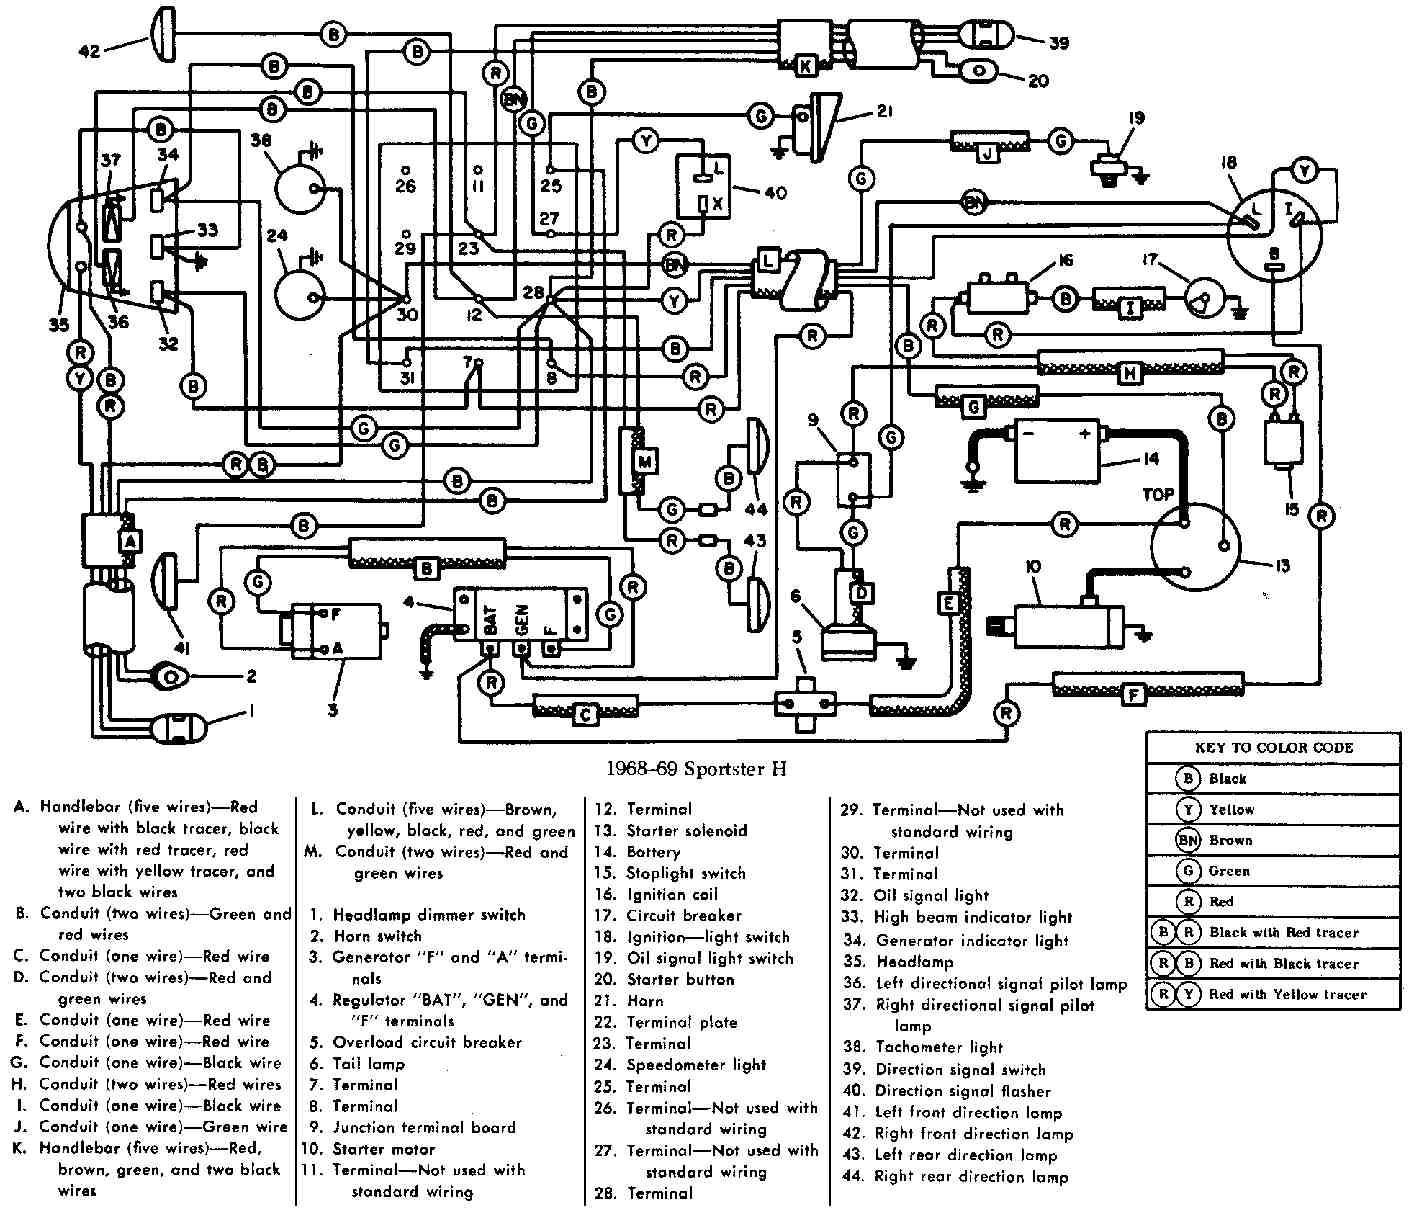 2005 harley davidson ultra classic wiring diagram [ 1409 x 1218 Pixel ]